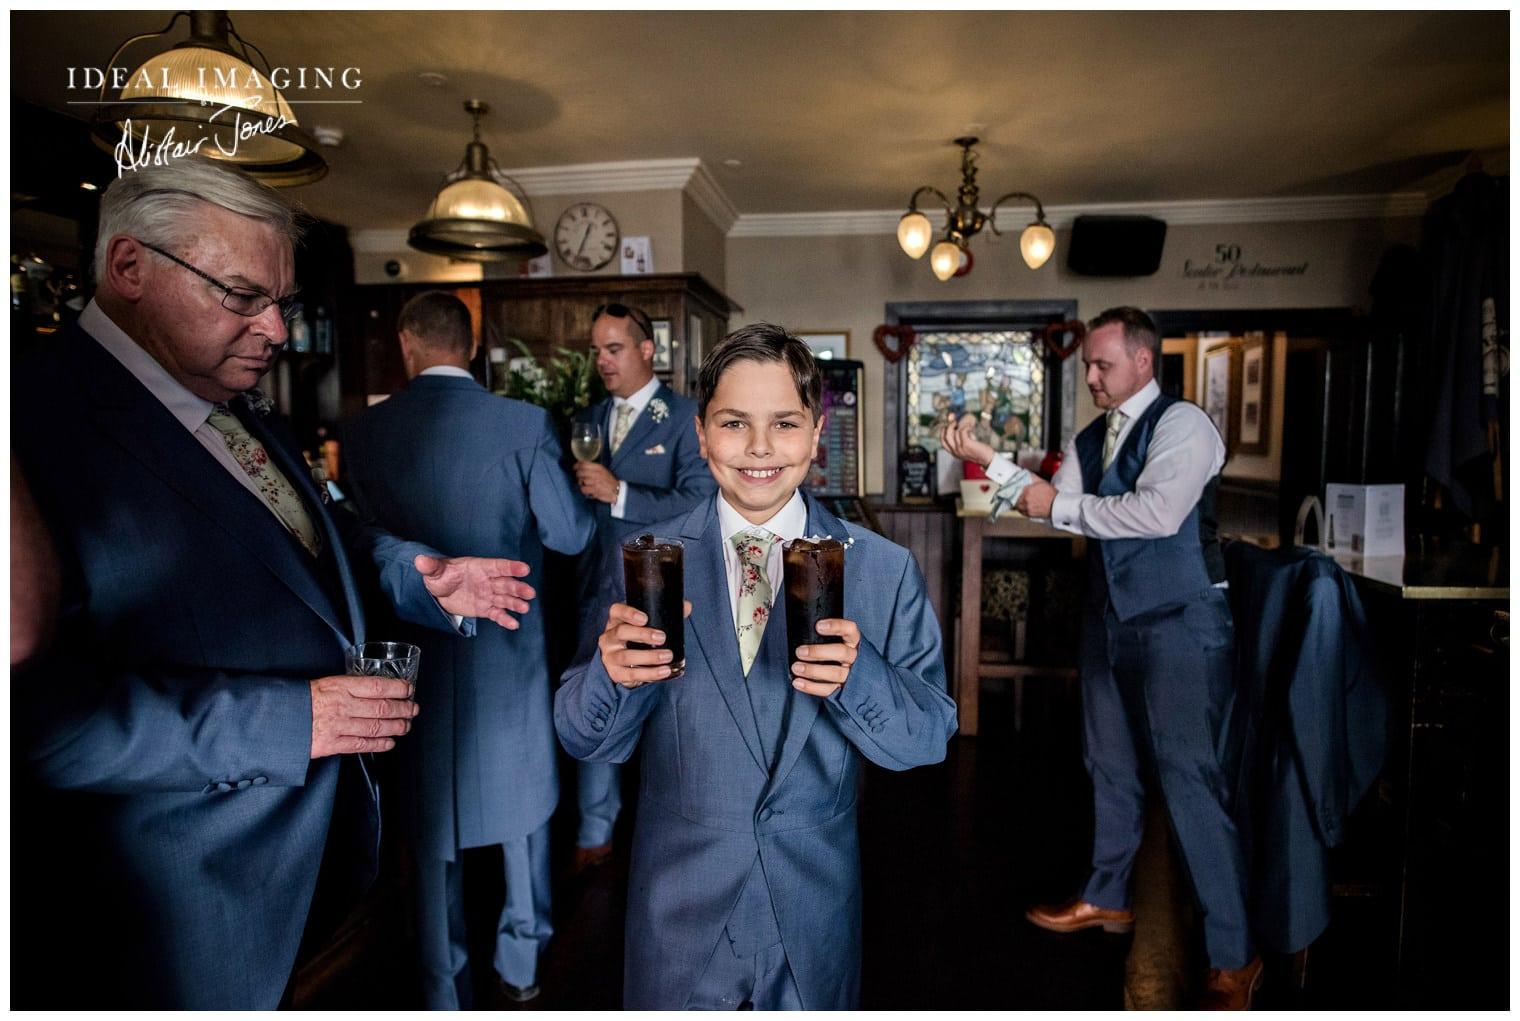 canterbury_cathedral_wedding-008